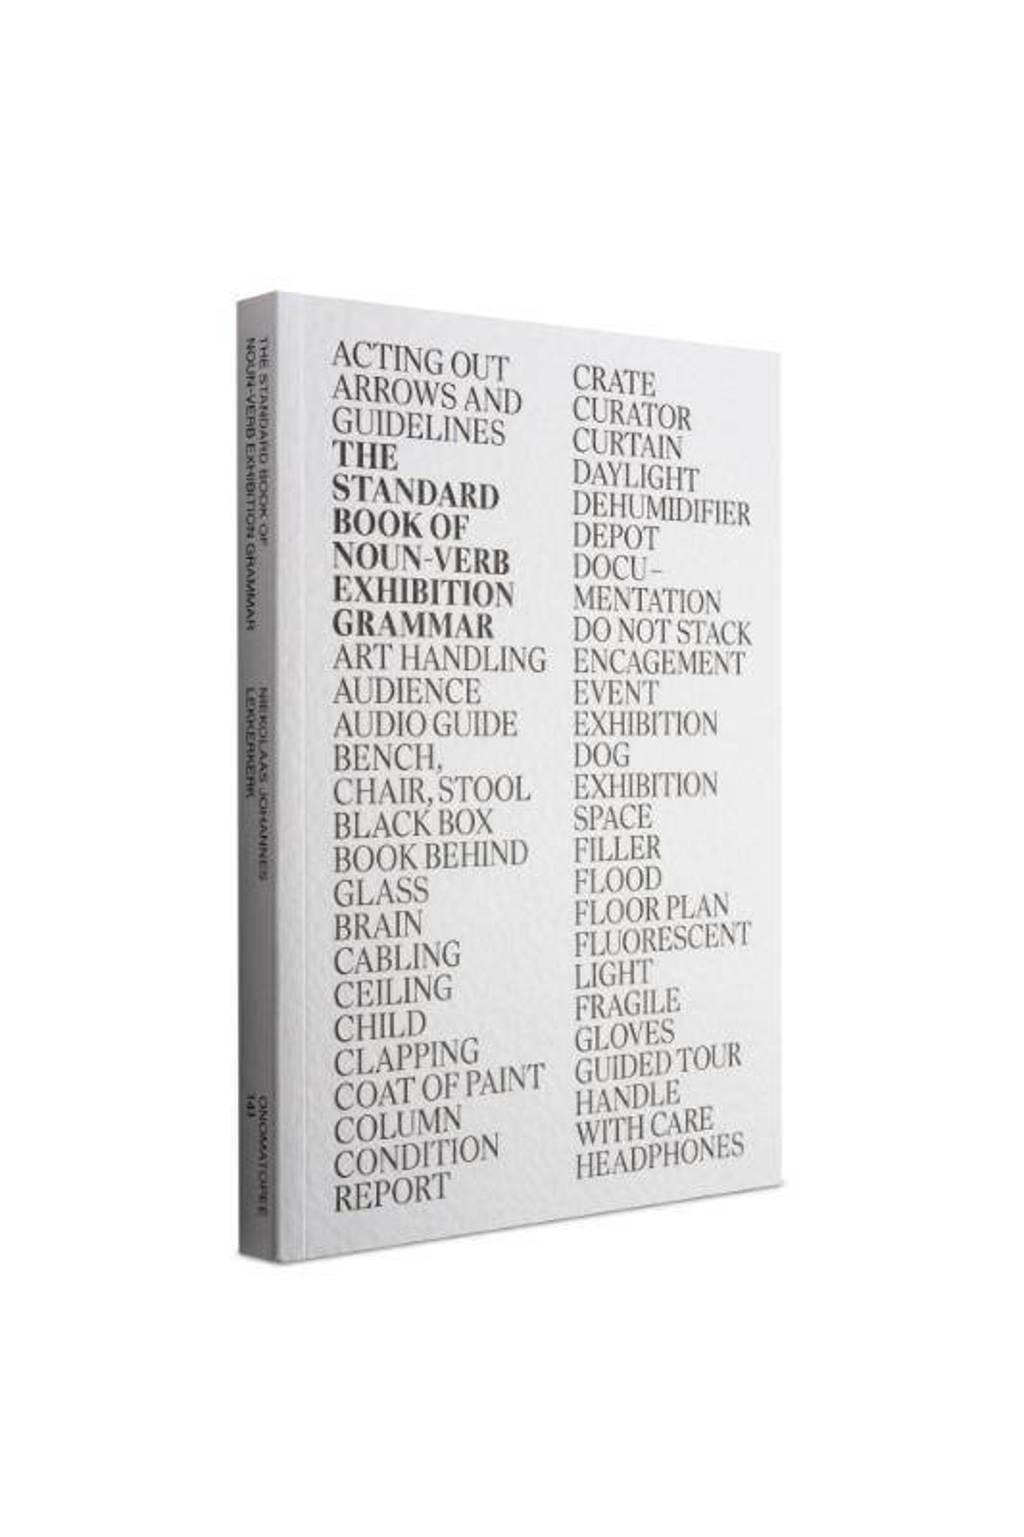 The standard book of noun-verb exhibition grammar - Niekolaas Johannes Lekkerkerk en Timotheus Vermeulen